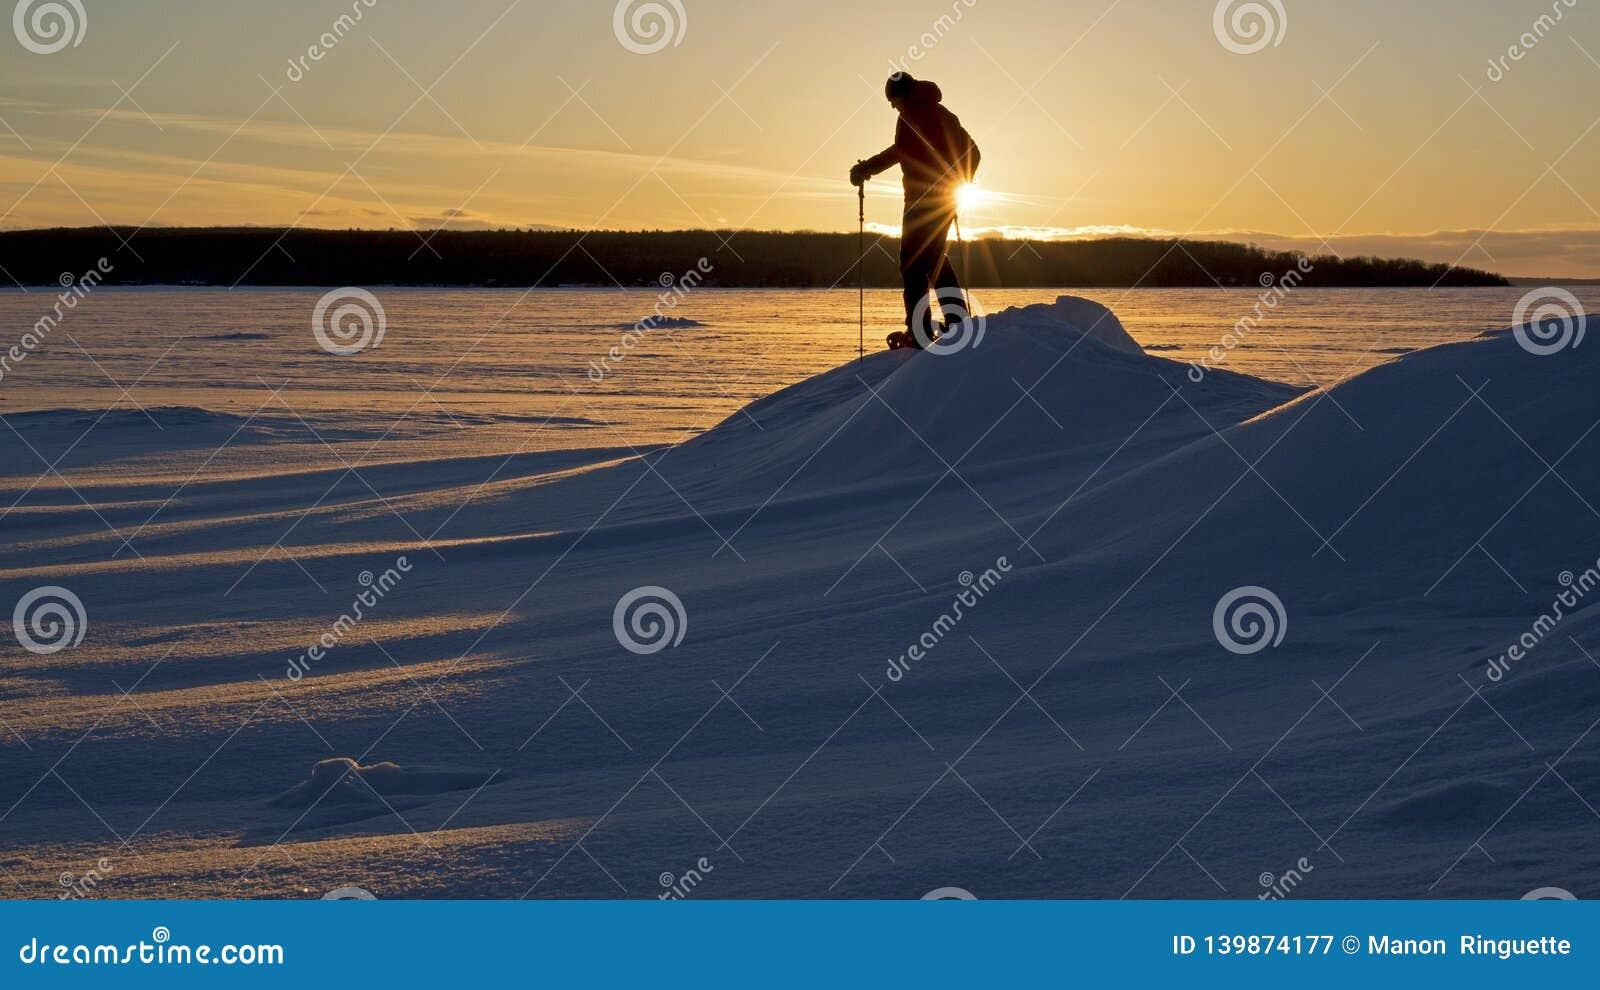 A Sunset Snowshoe hike on a Frozen Lake